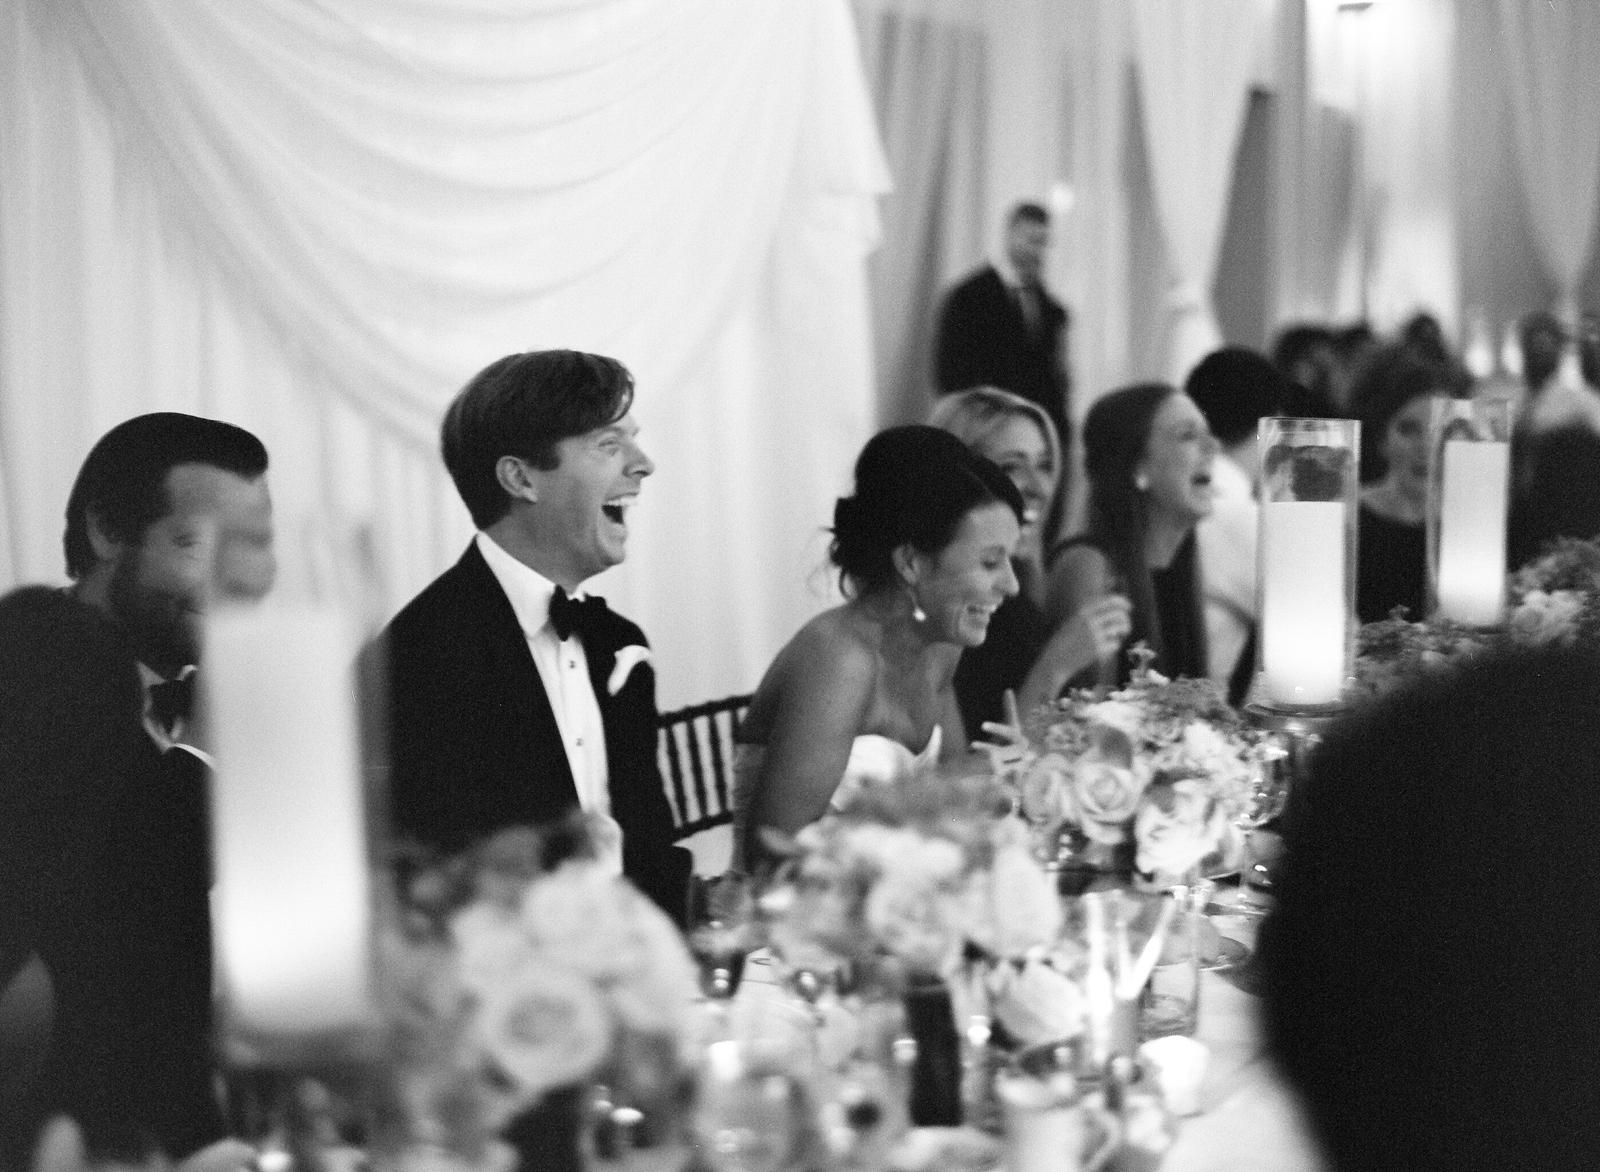 atrium at curtis center wedding photographer philadelphia wedding photographer shannon griffin_0044.jpg